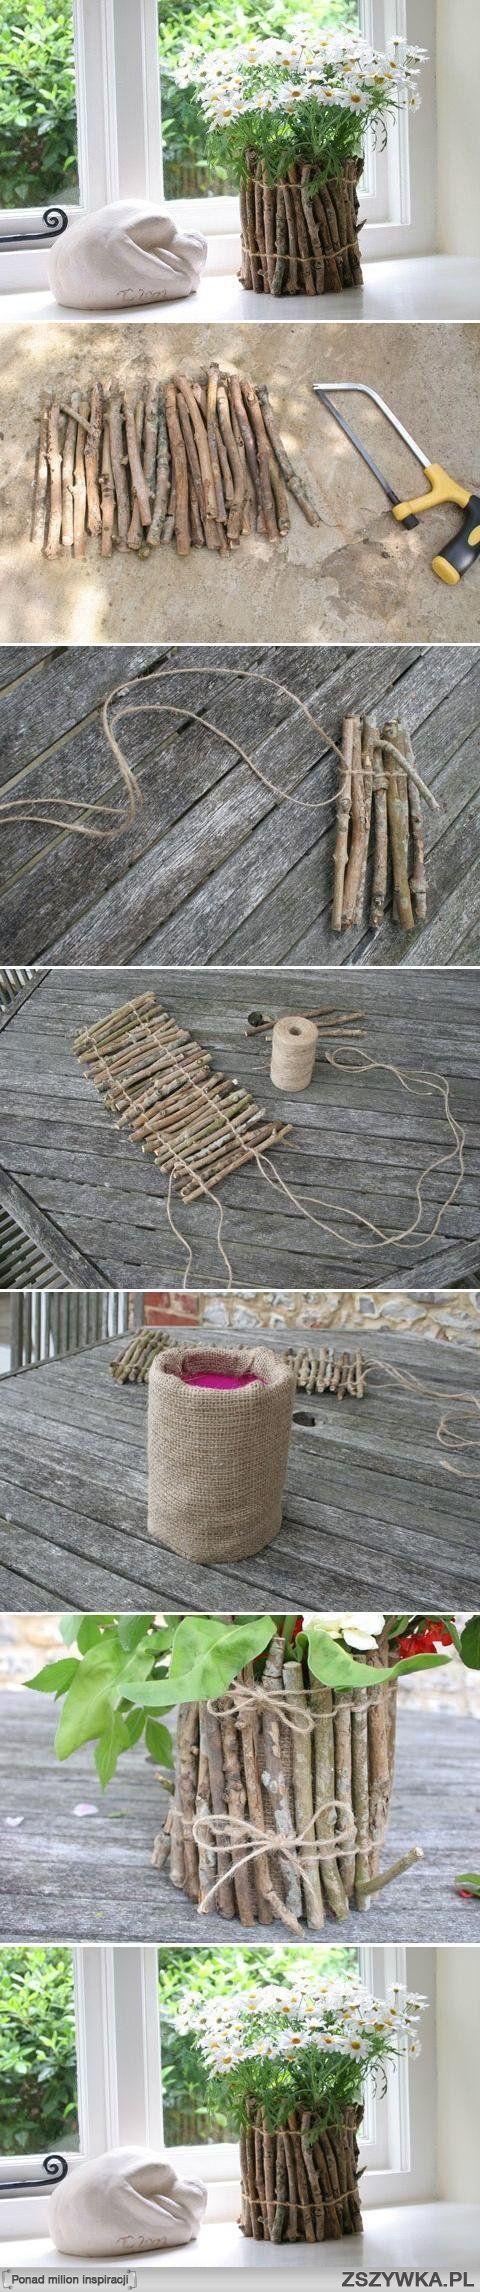 Easy idea to decorate a pot